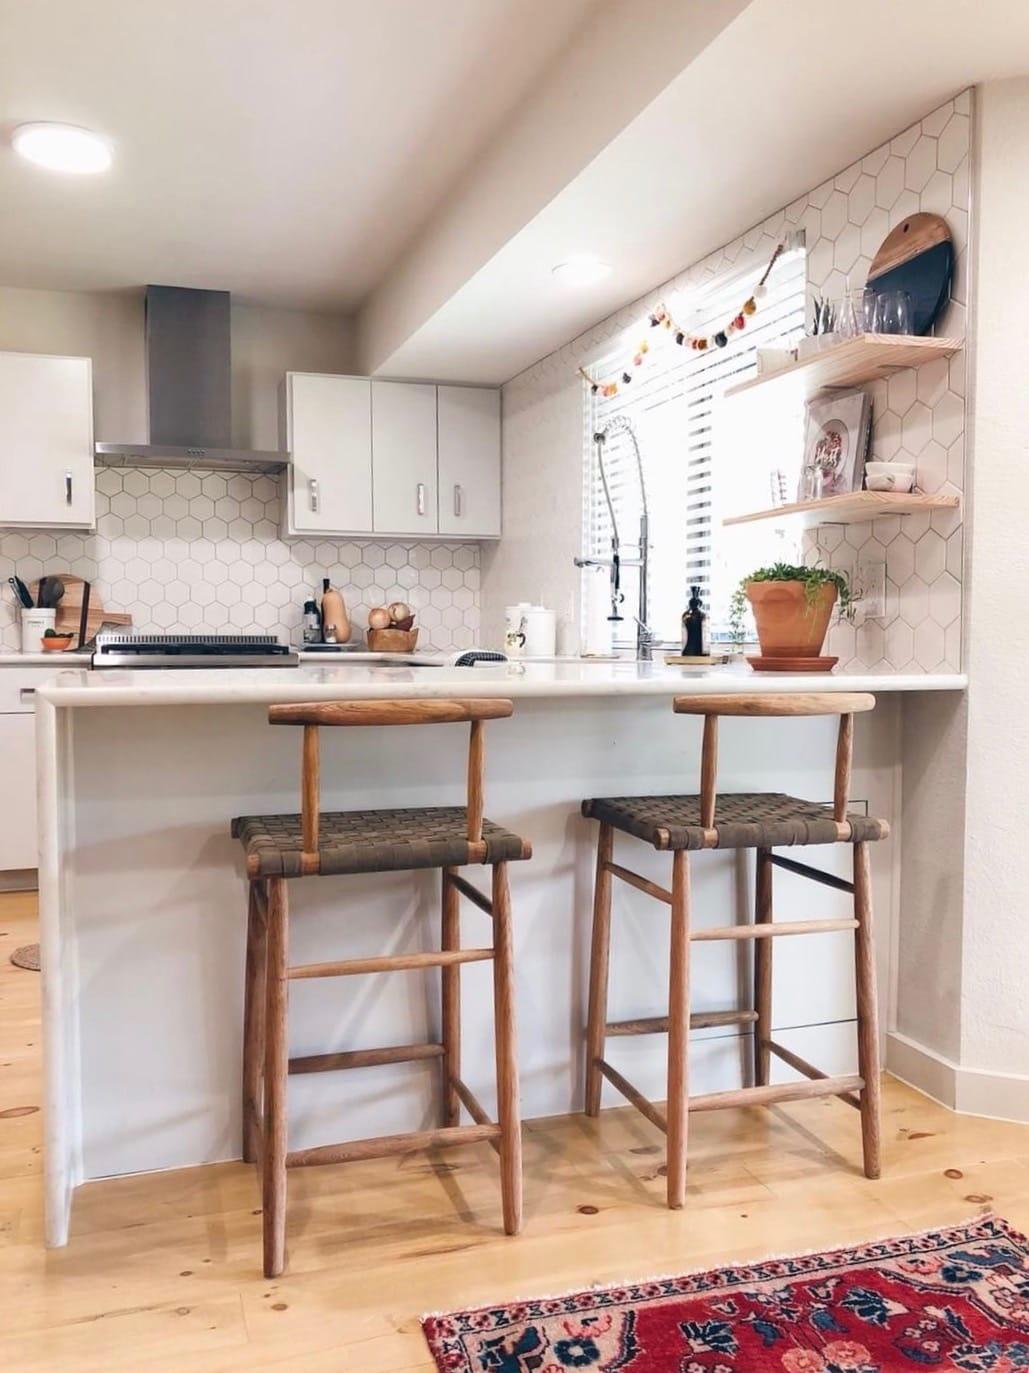 Hanging kitchen shelves in @kaceydurbin house!